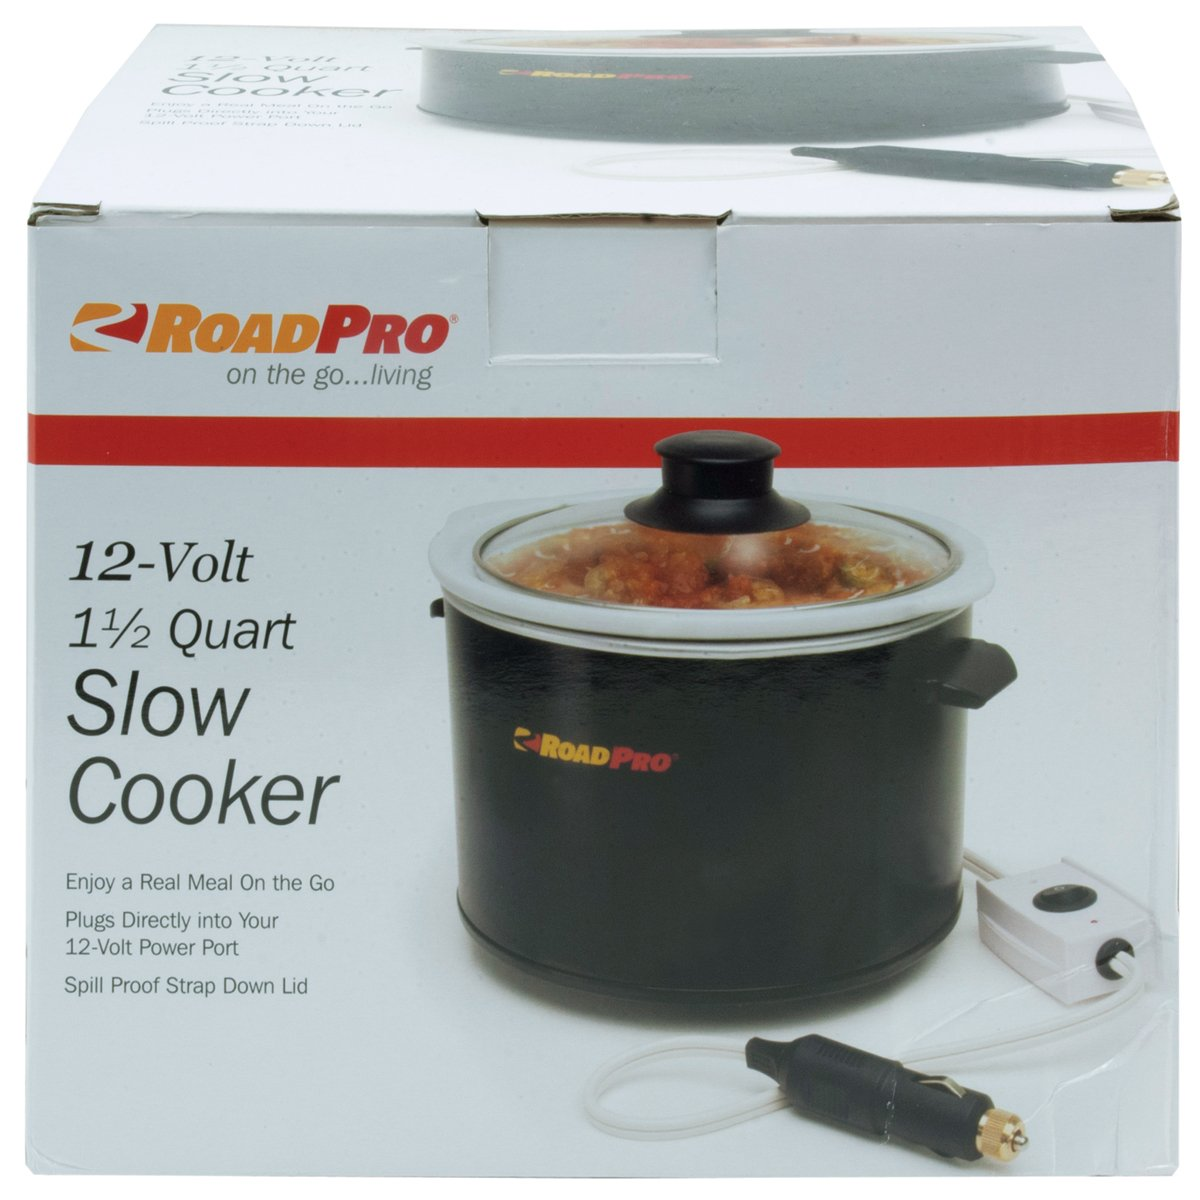 Amazon.com: RoadPro RPSL-350 12V 1.5 Quart Slow Cooker: Automotive